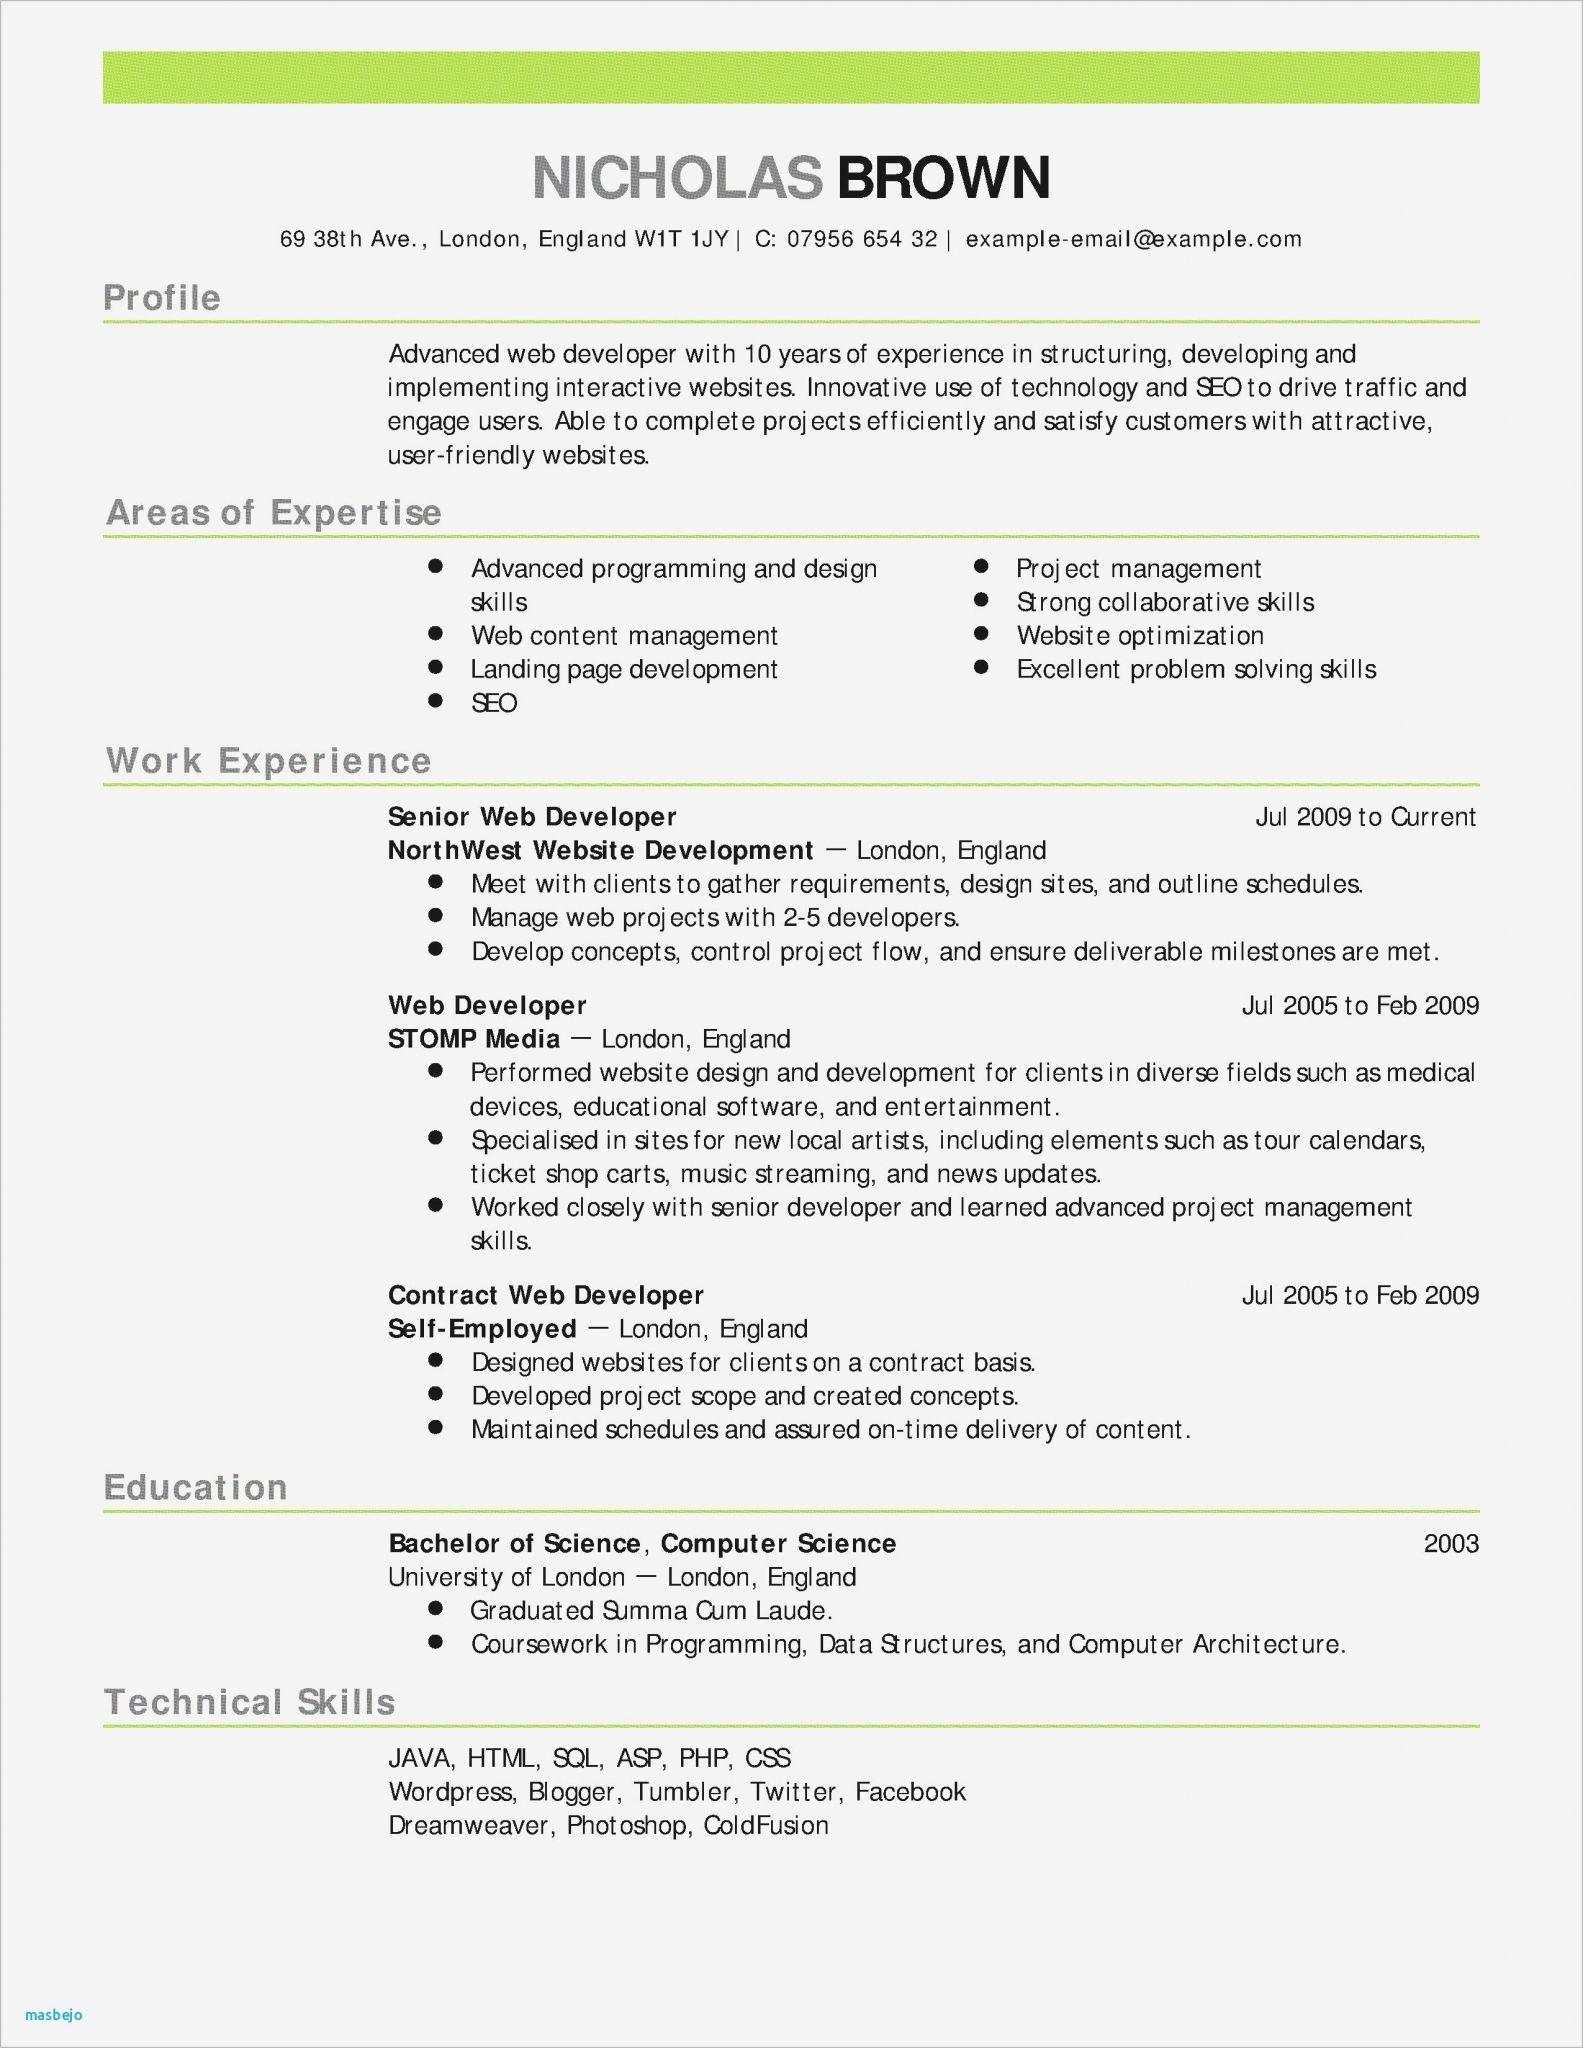 Impulse Control Worksheets Printable | Briefencounters | Impulse Control Worksheets Printable